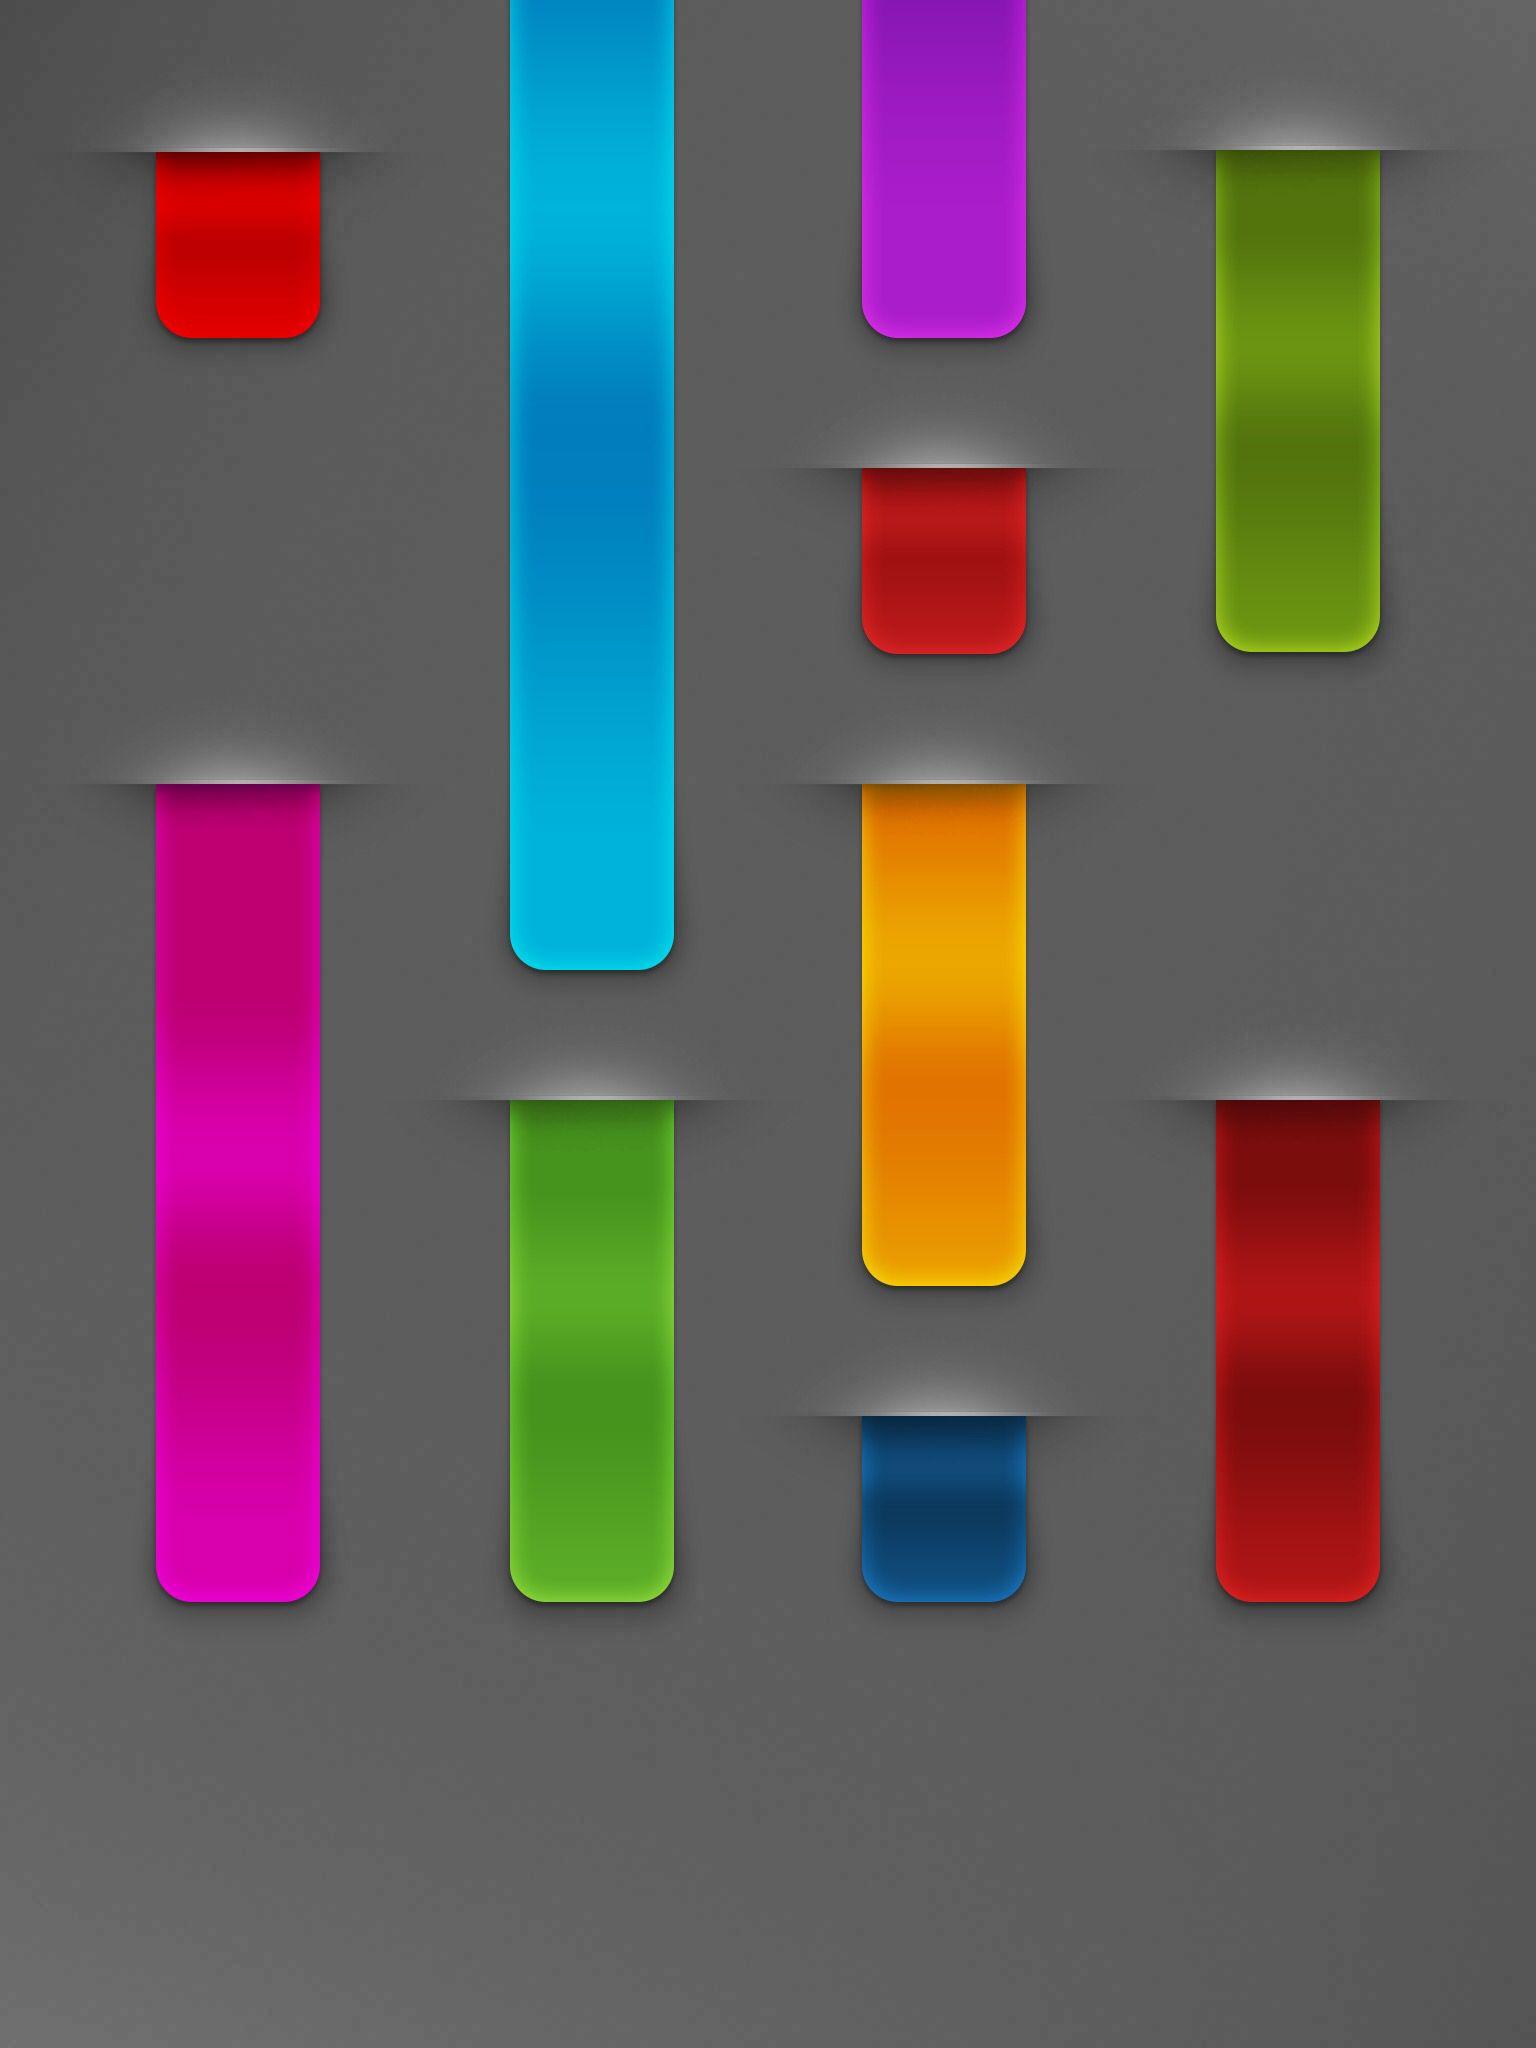 App Icon Skin Wallpaper Ipad Mini Wallpapers Ipad Mini